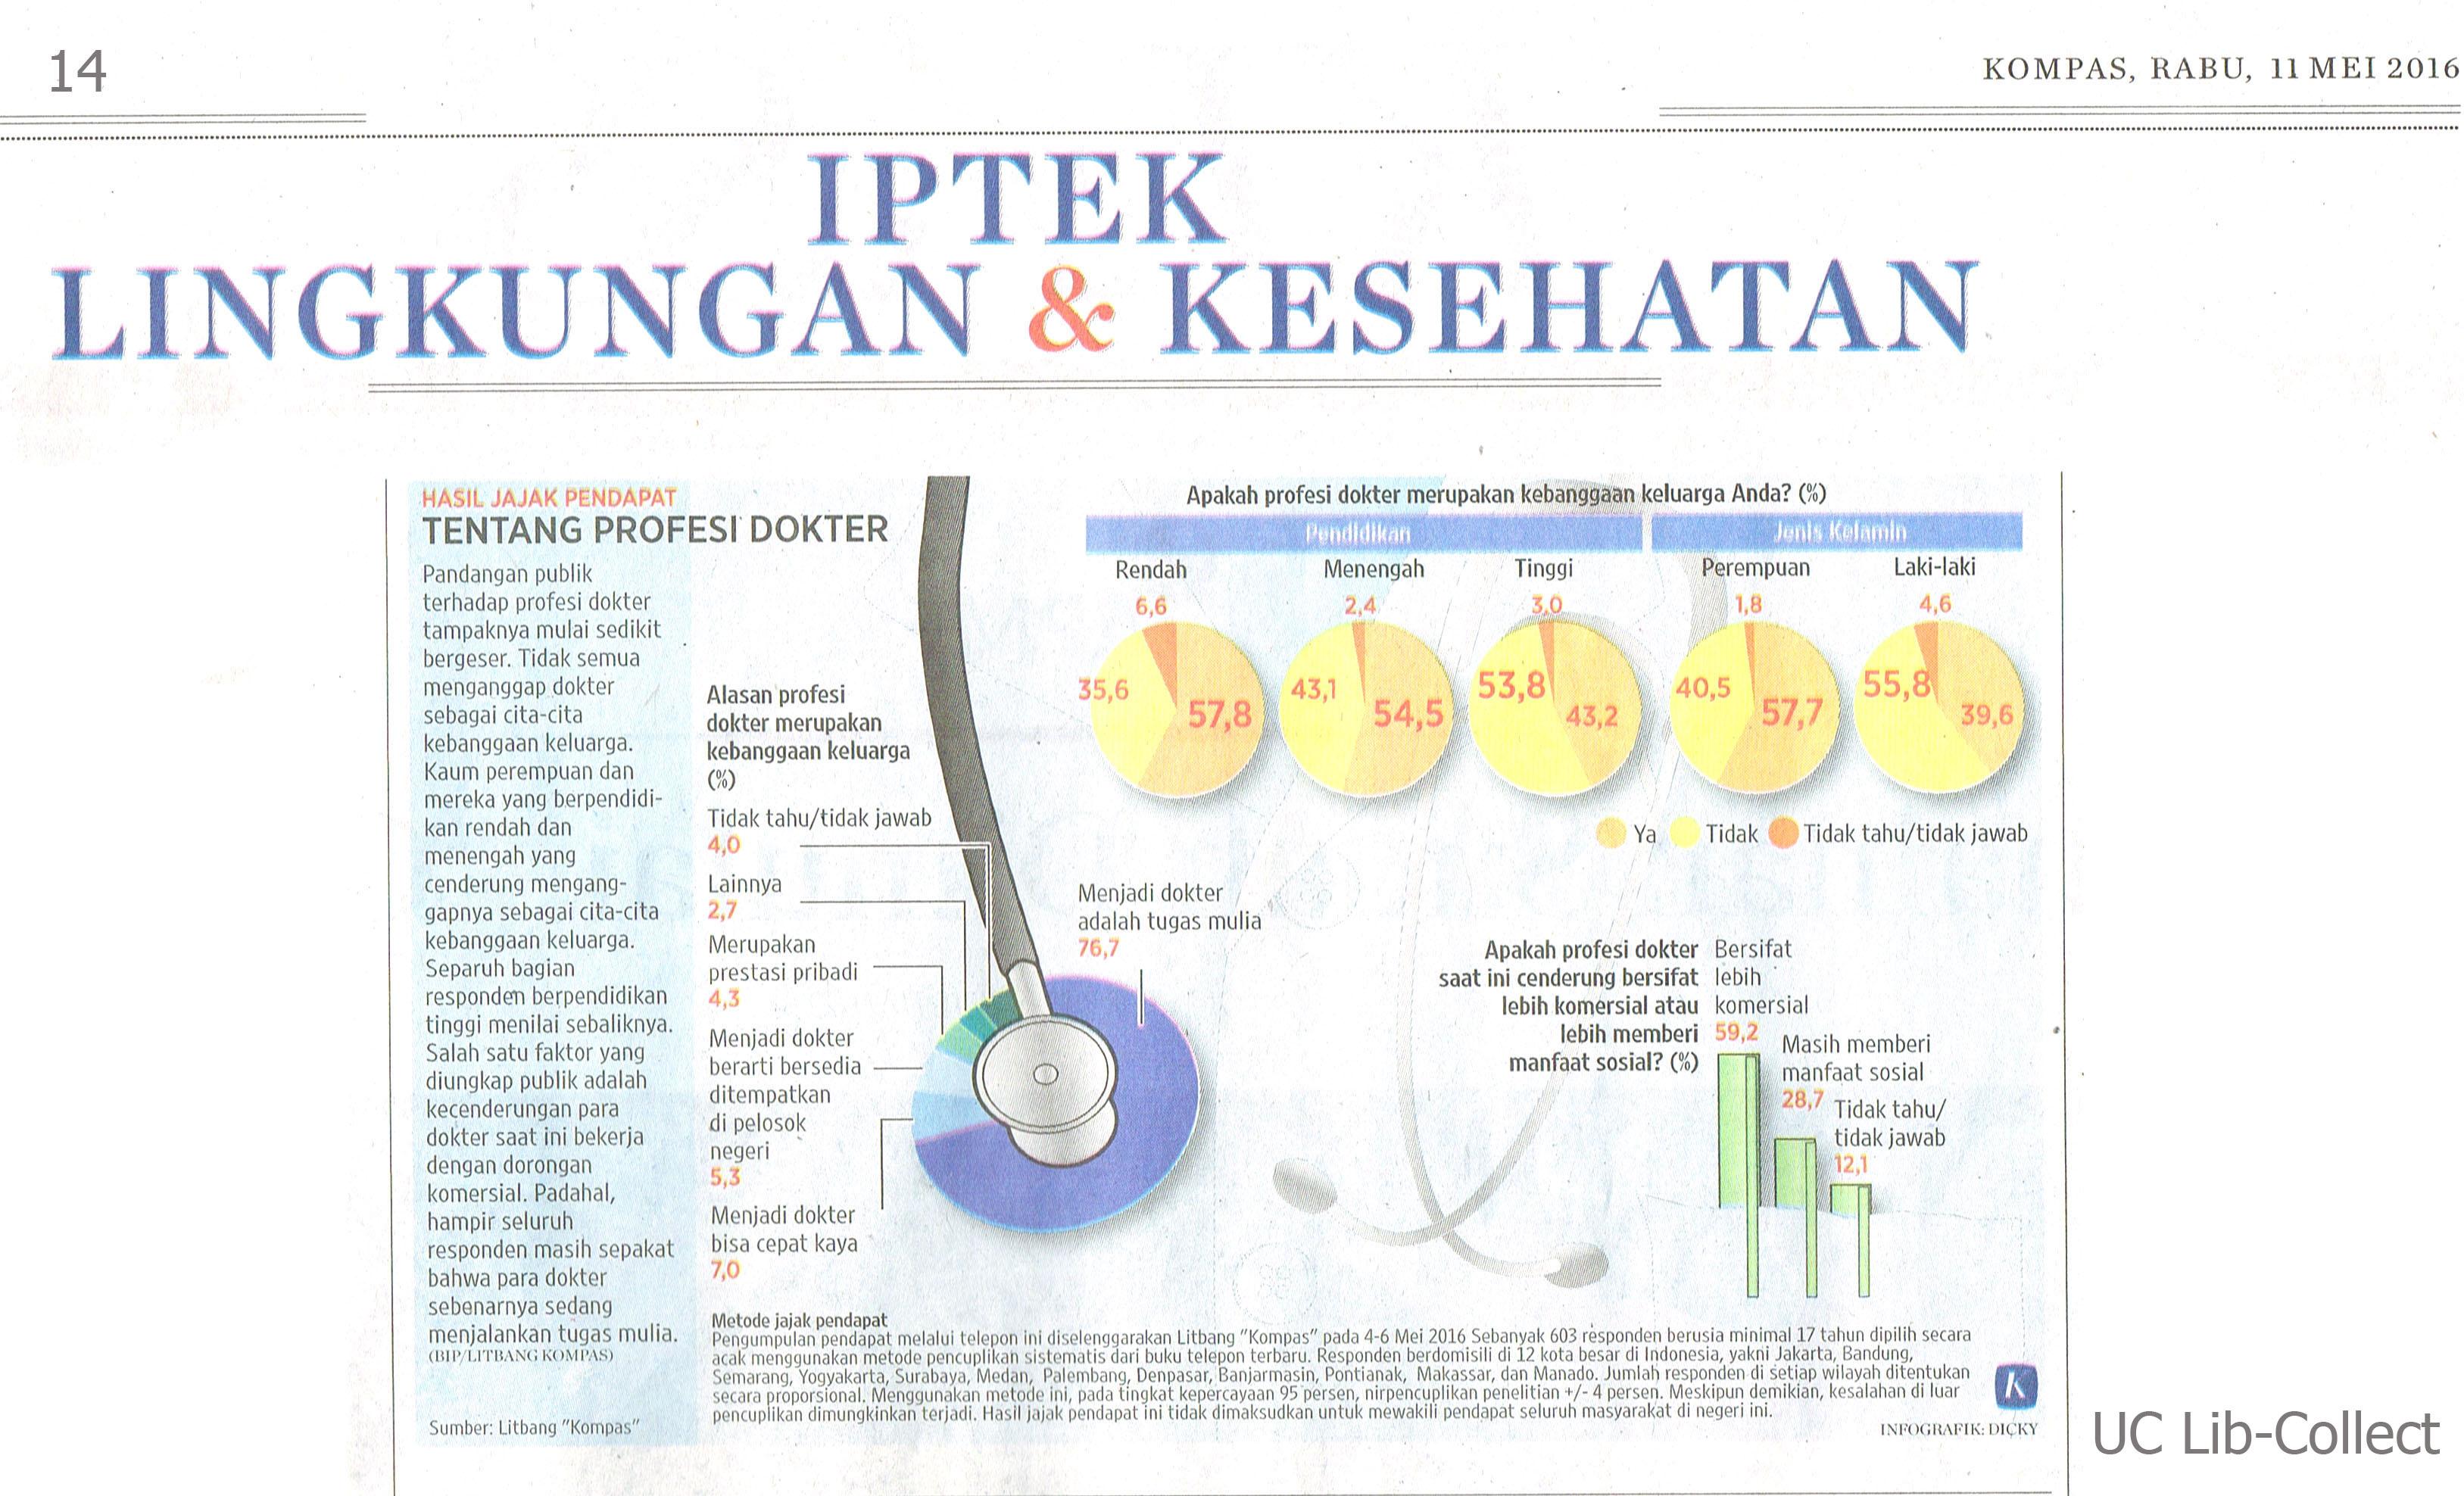 Hasil Jajak Pendapat Tentang Profesi Dokter.Kompas. 11 Mei 2016. Hal.14